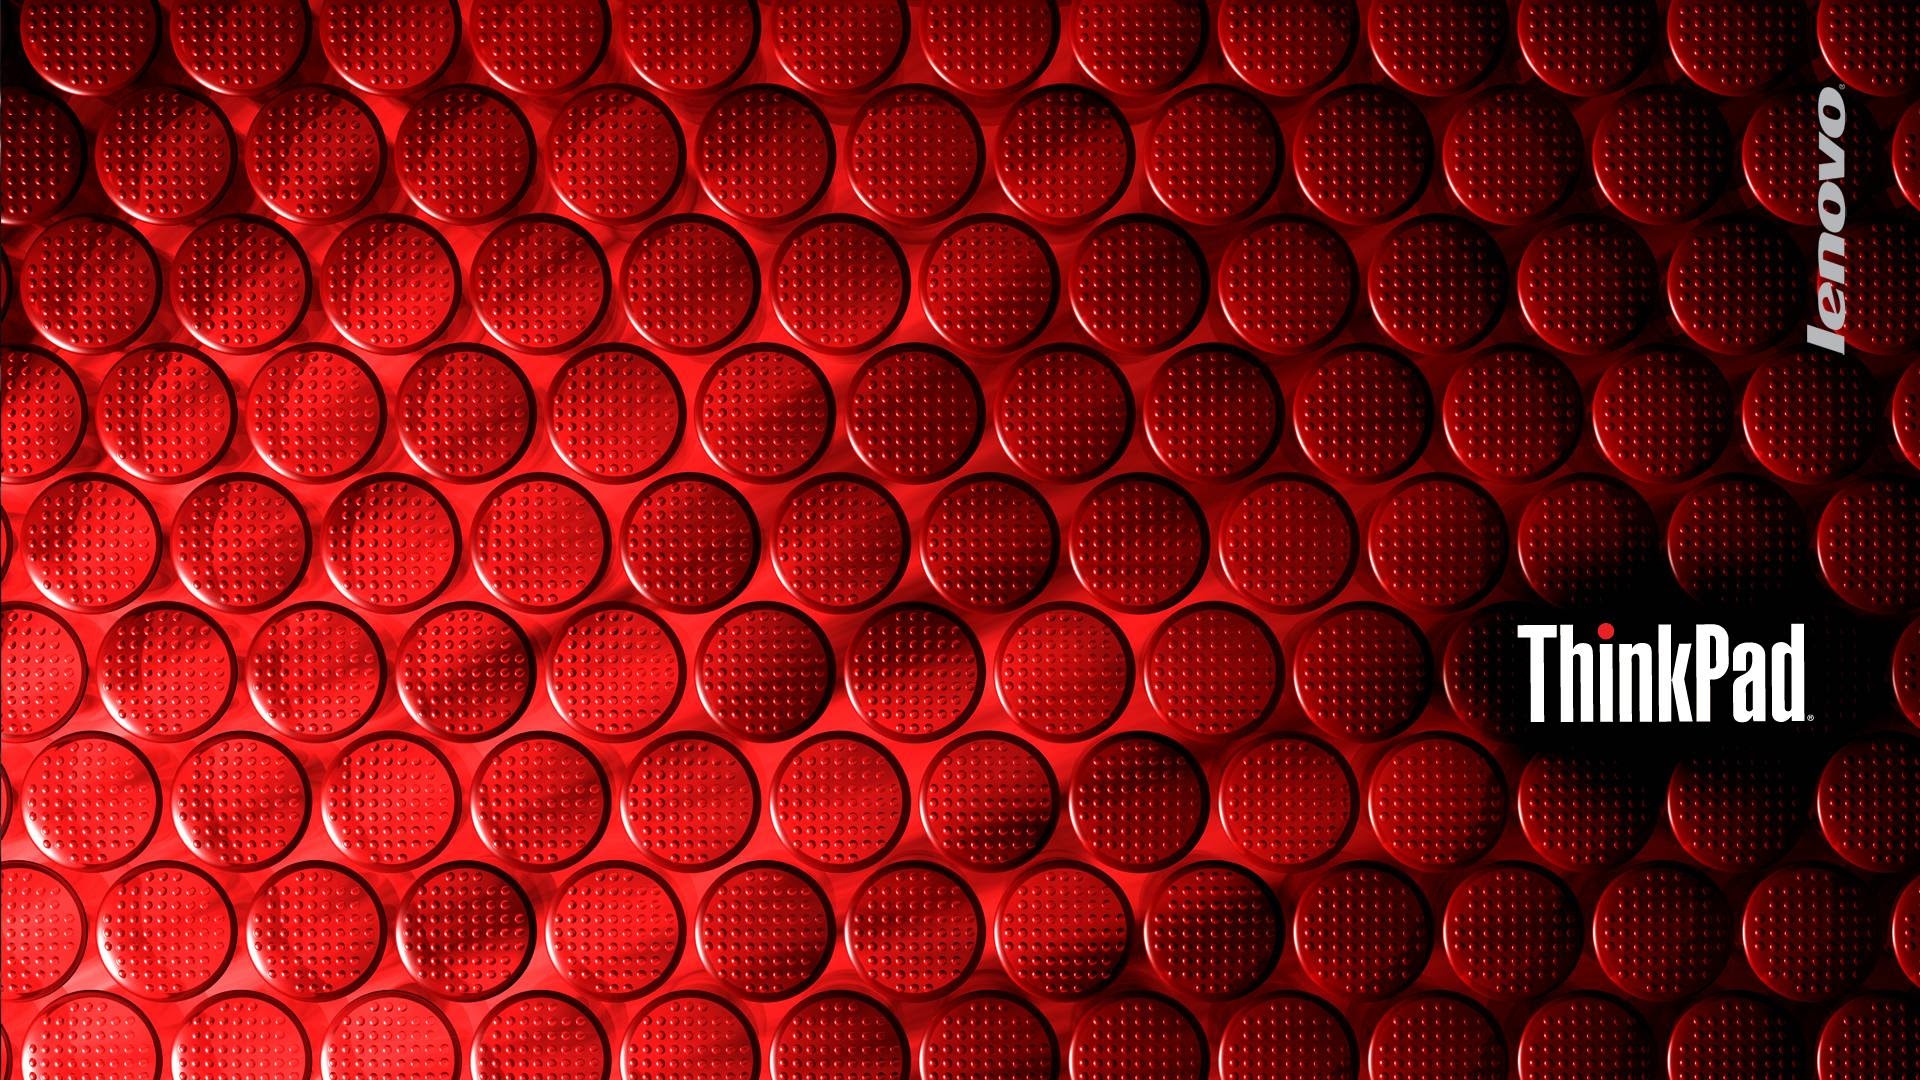 Lenovo ThinkPad Wallpapers - Wallpaper Cave